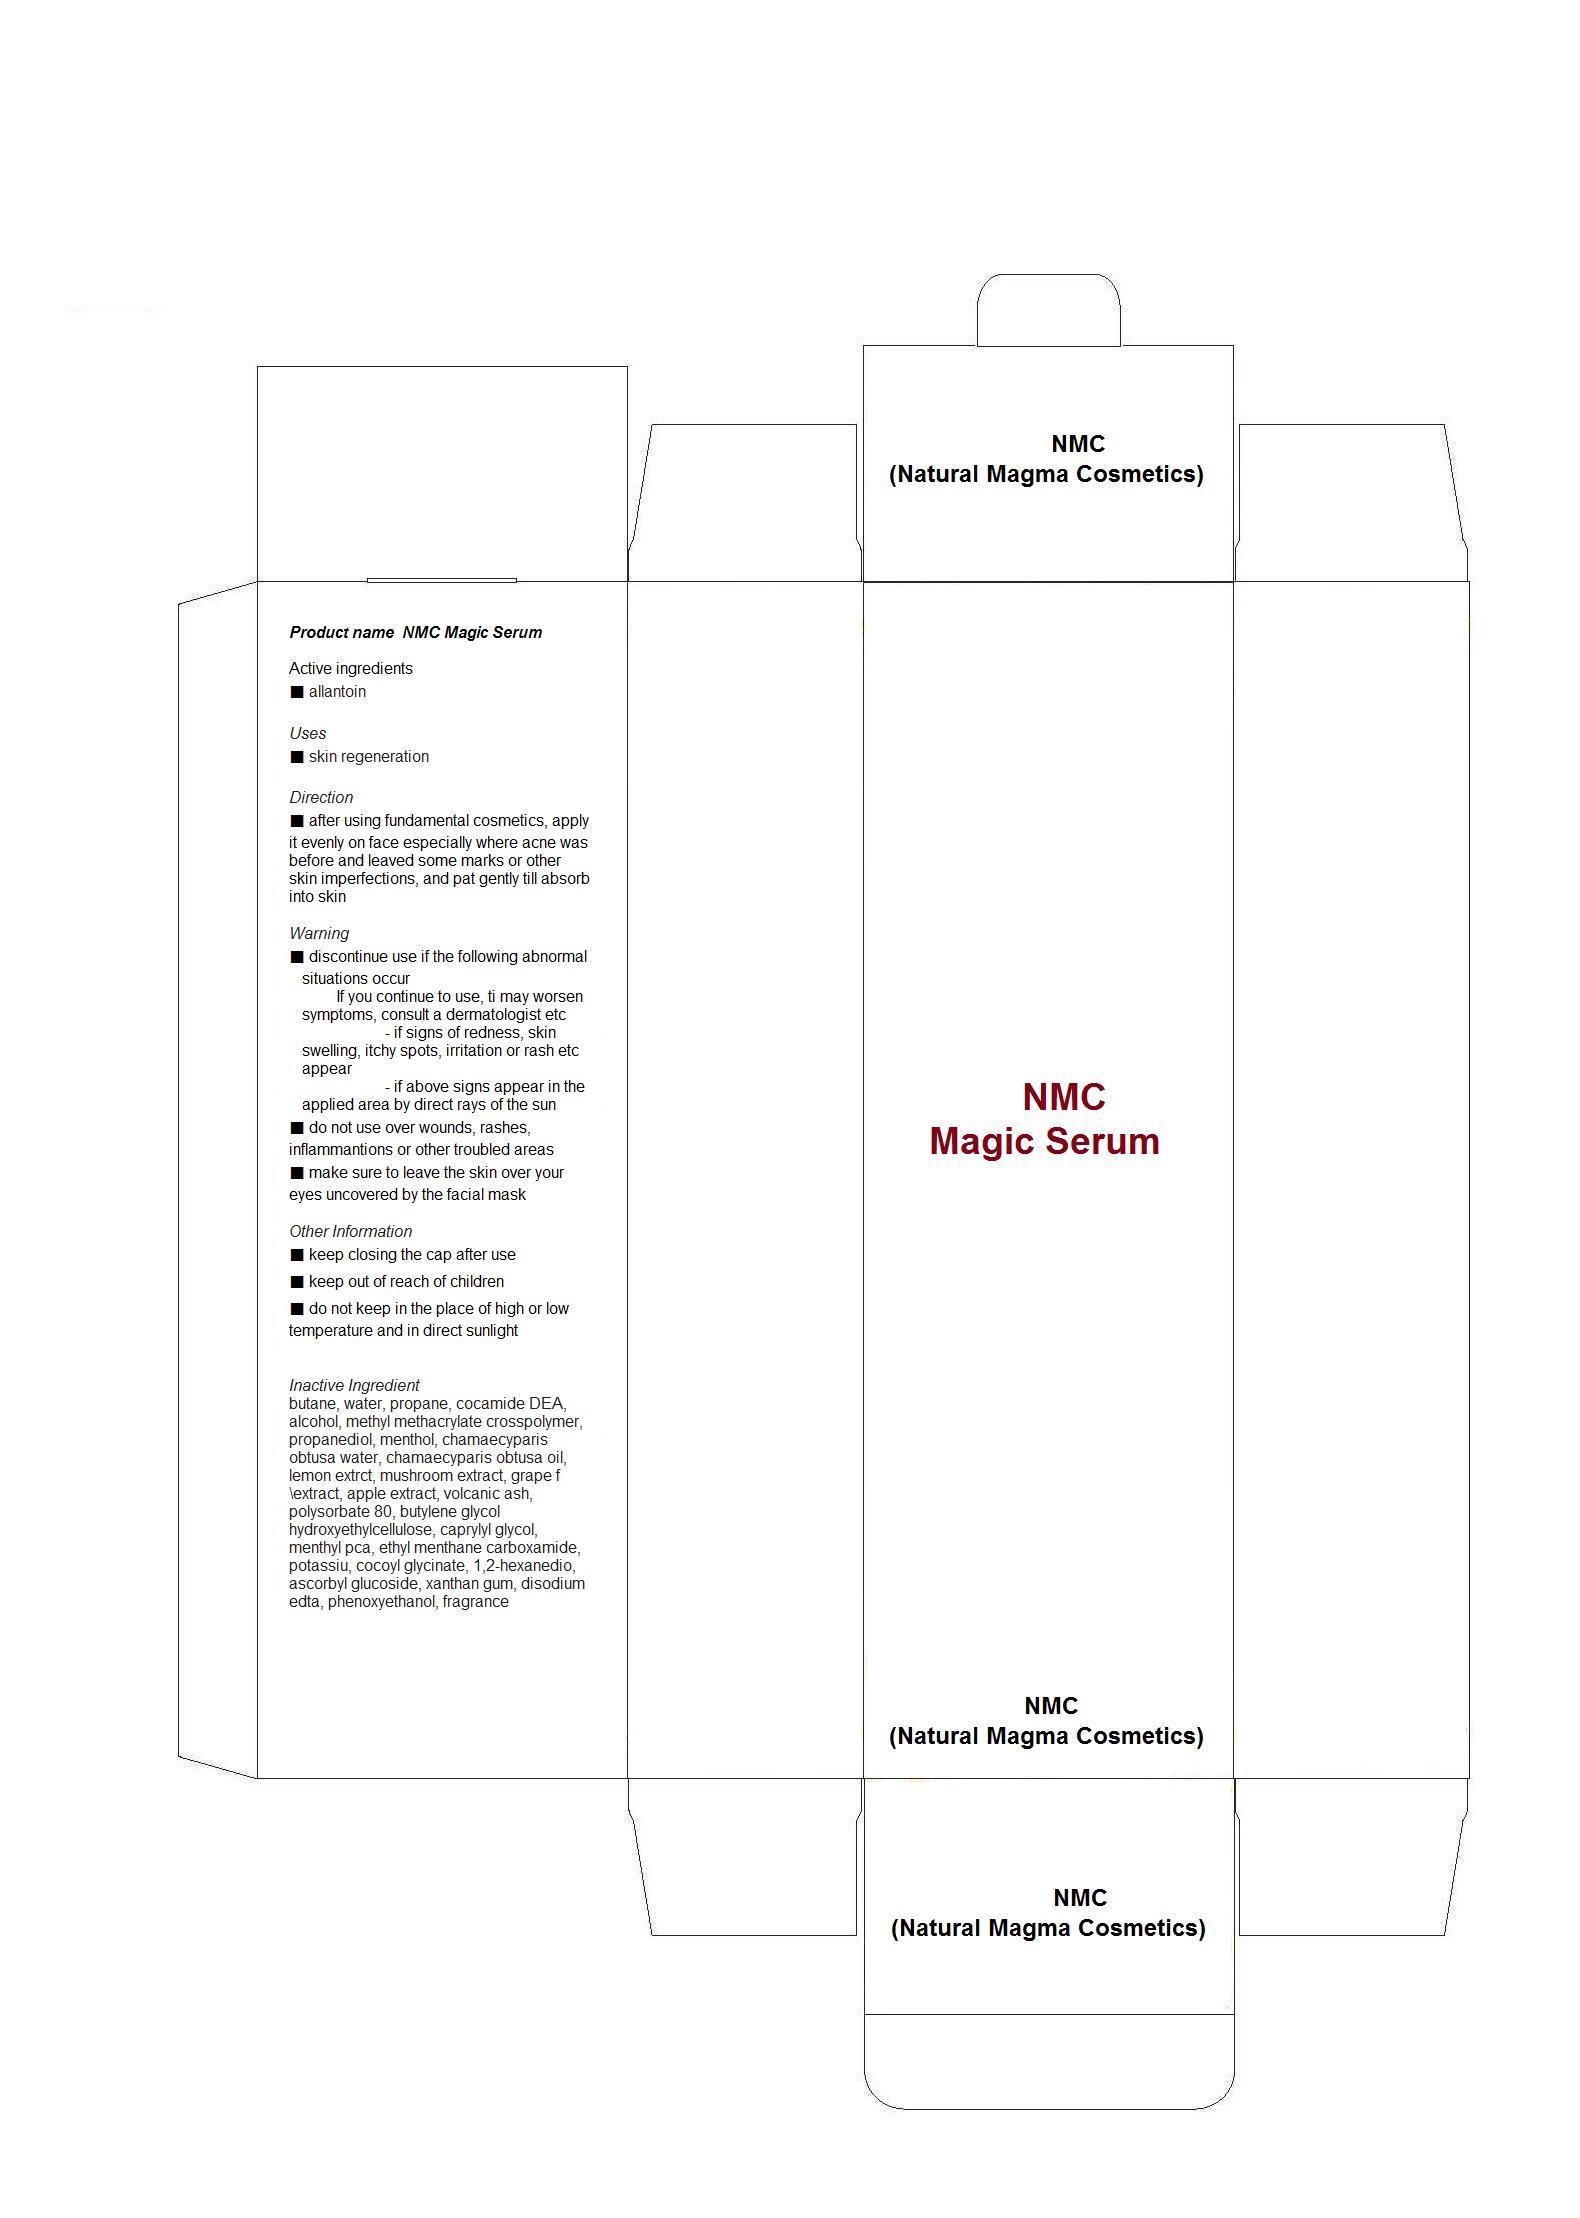 Nmc Magic Serum (Allantoin) Liquid [Nmc (Natural Magma Cosmetics)]